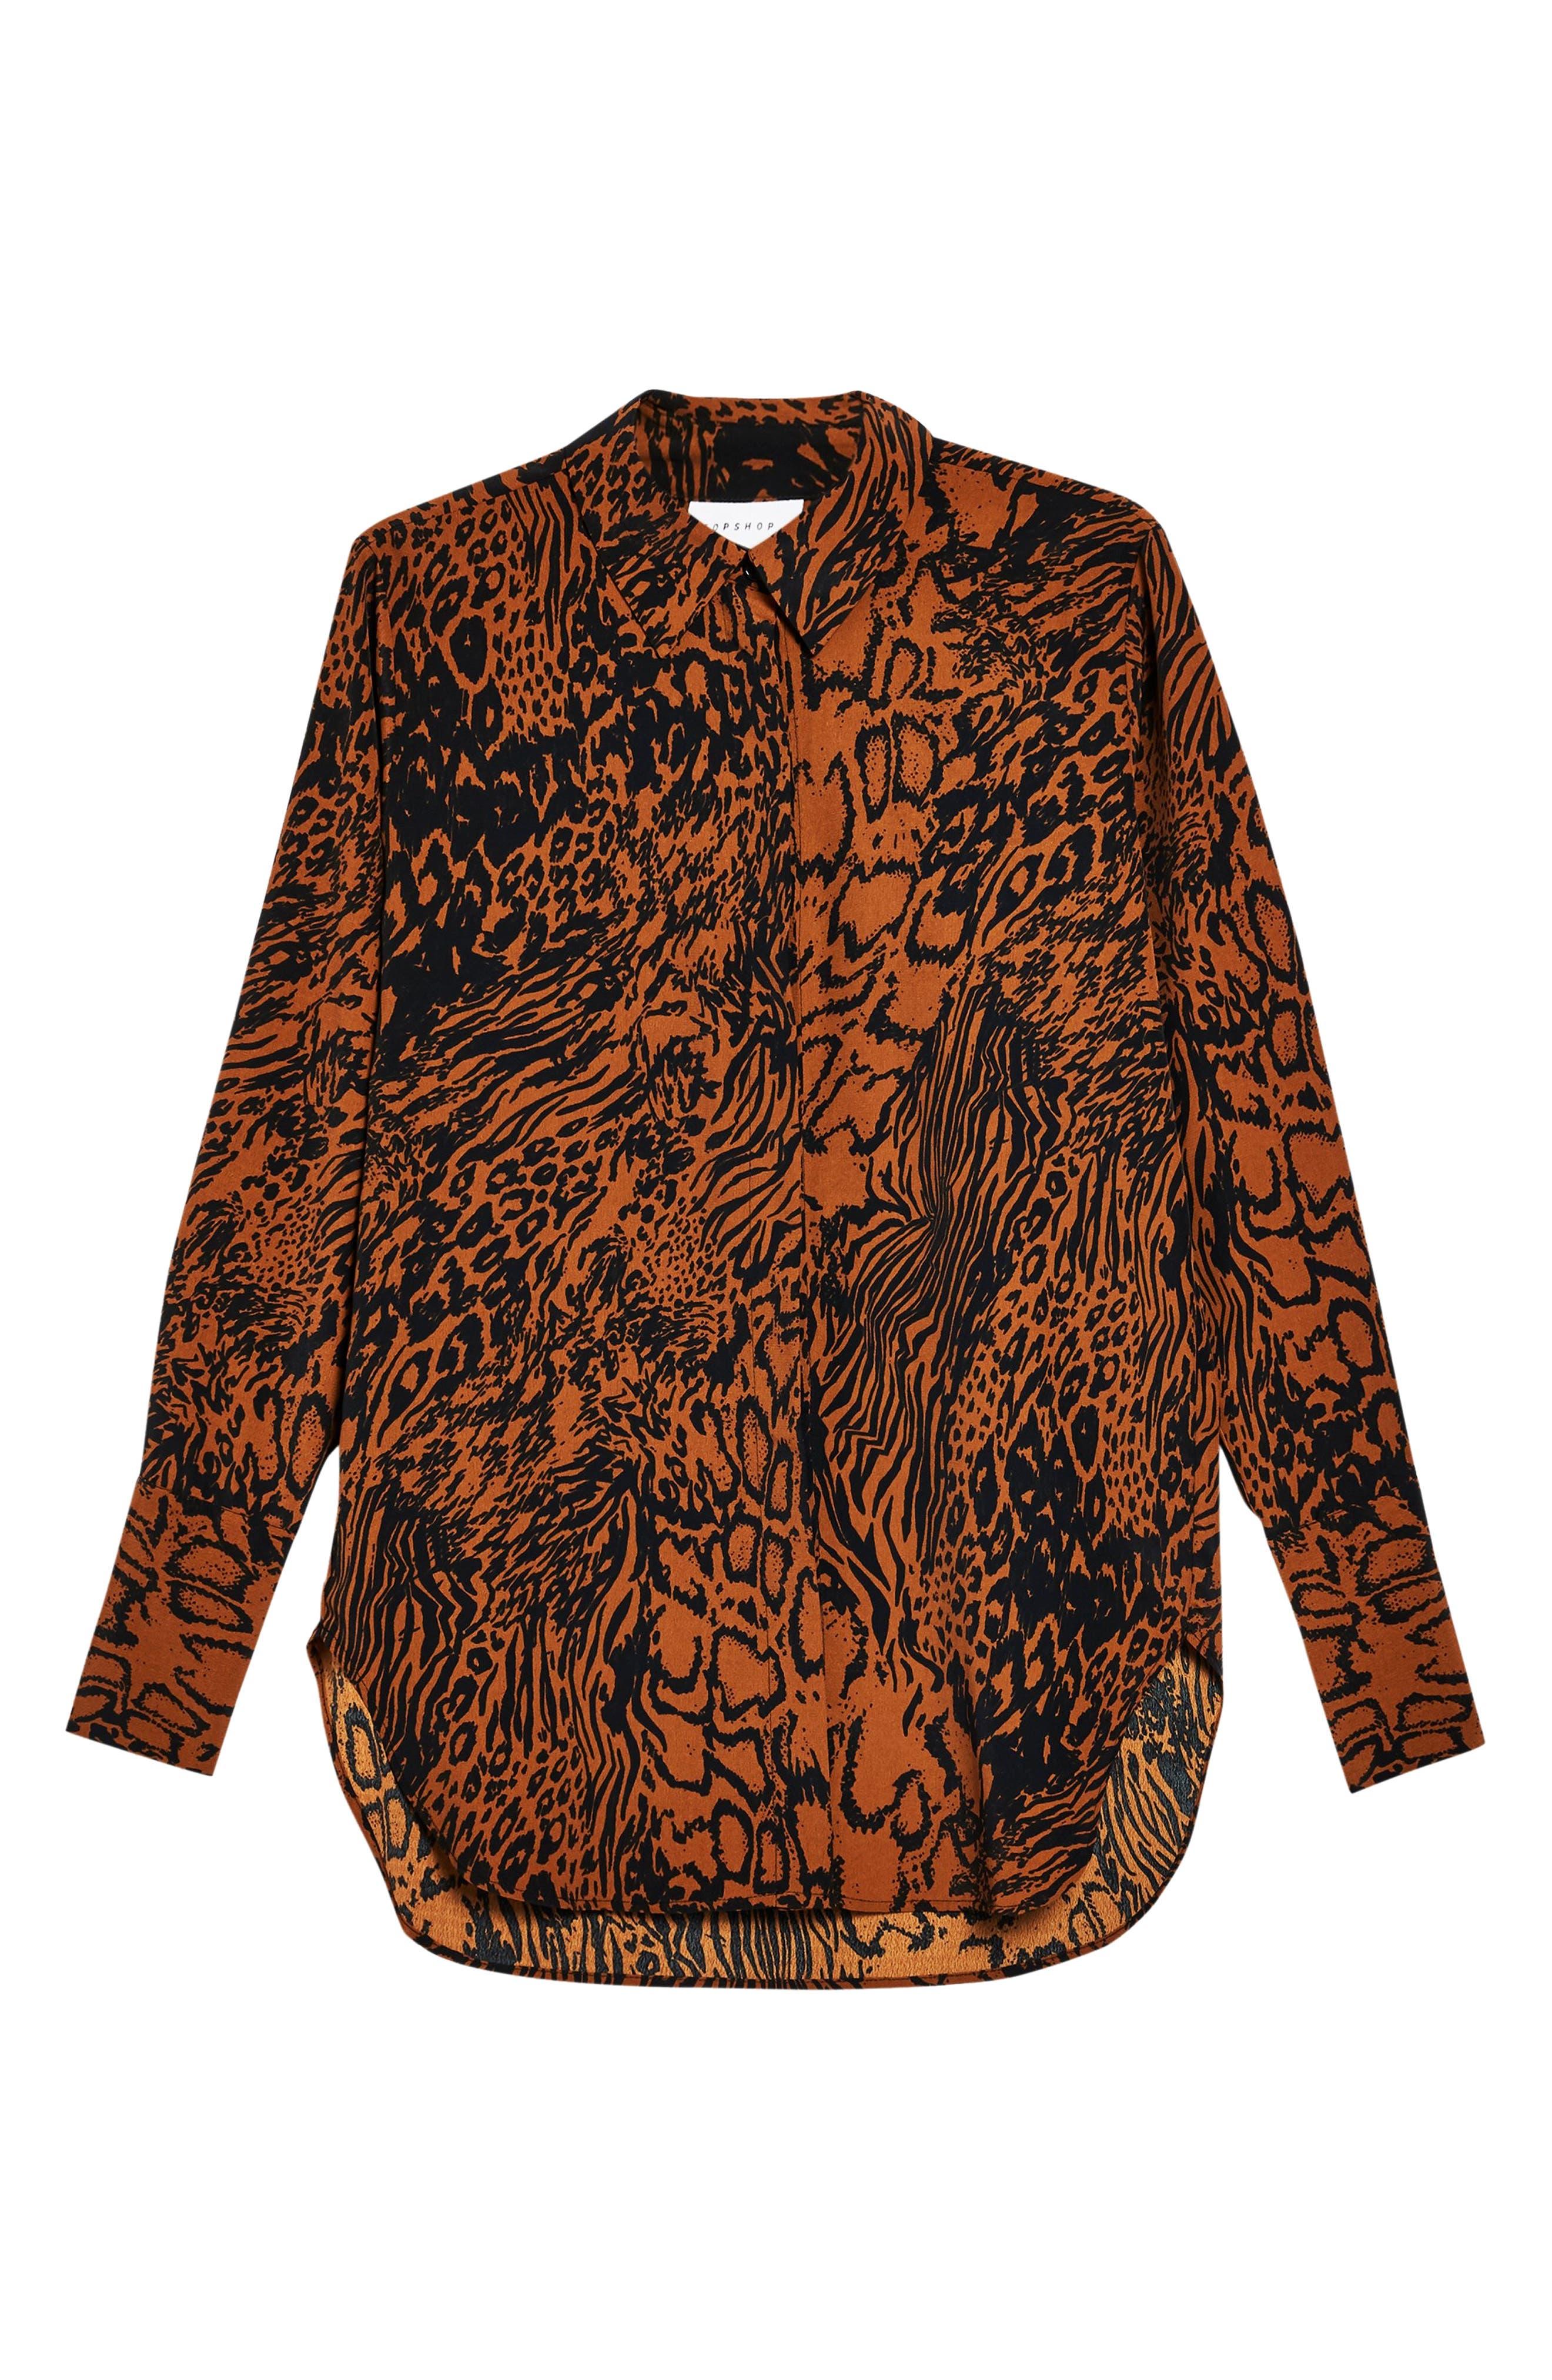 Mensy Snake Print Shirt,                             Alternate thumbnail 3, color,                             BROWN MULTI